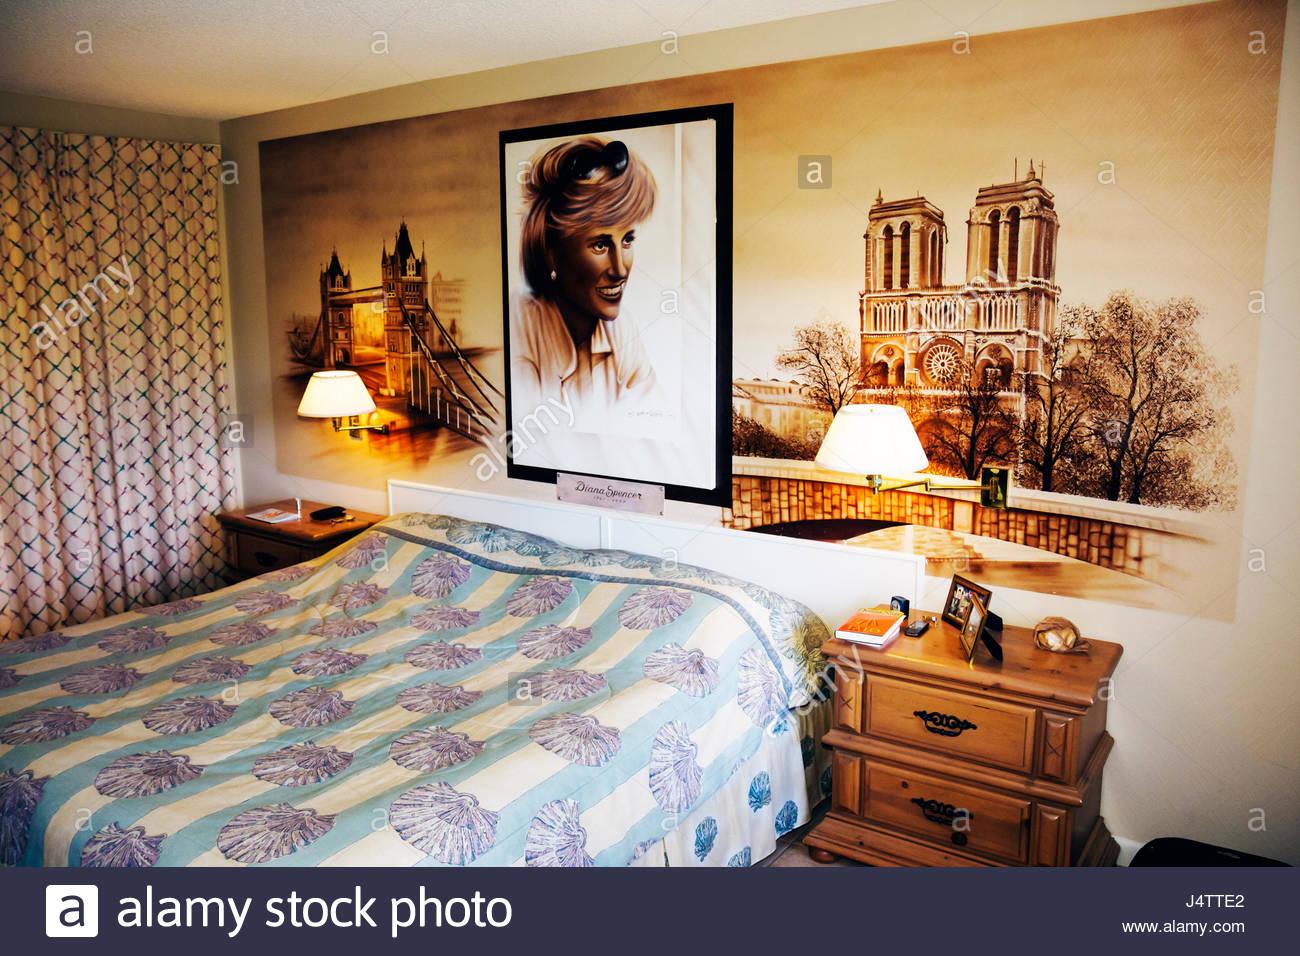 Diana gold guestroom